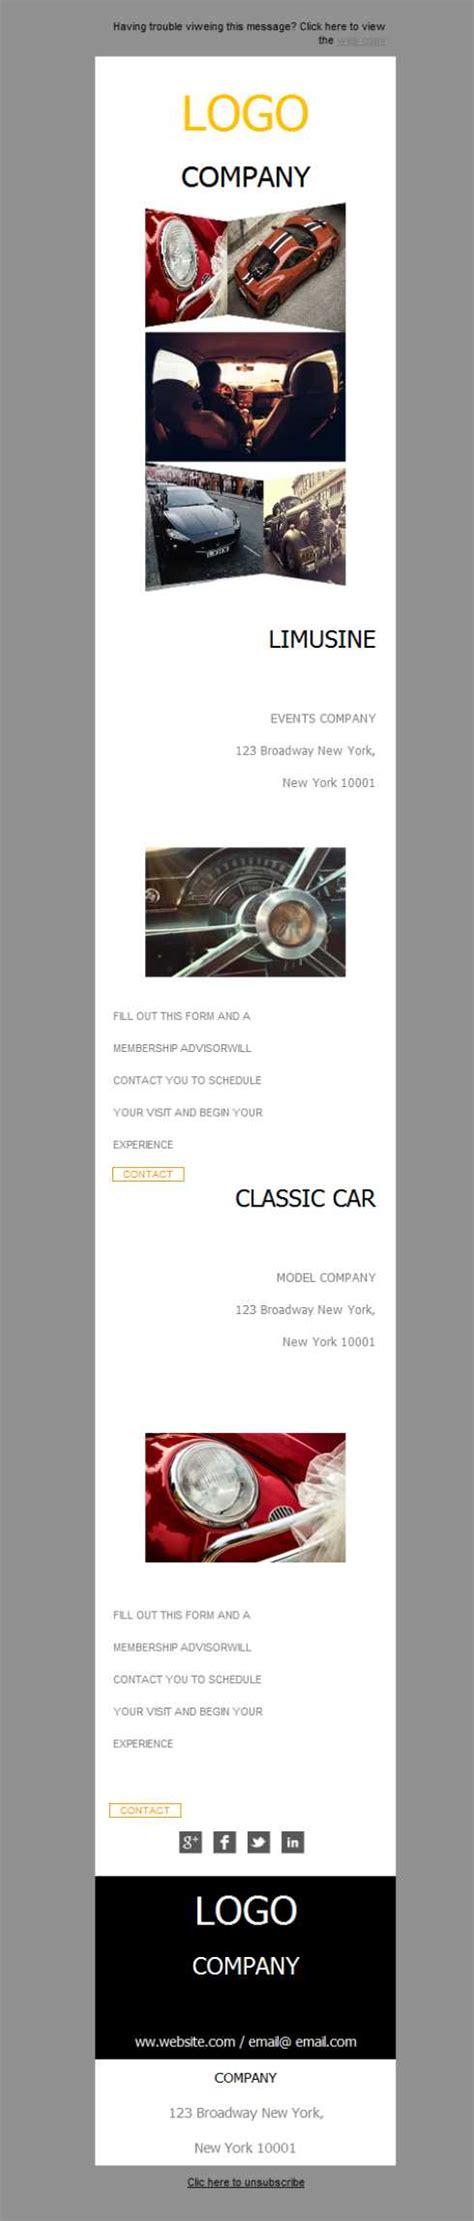 Plantilla De Newsletter Responsive Gratis Quot Car Dealer Classic Quot Para Email Marketing Mailify Car Sales Newsletter Template